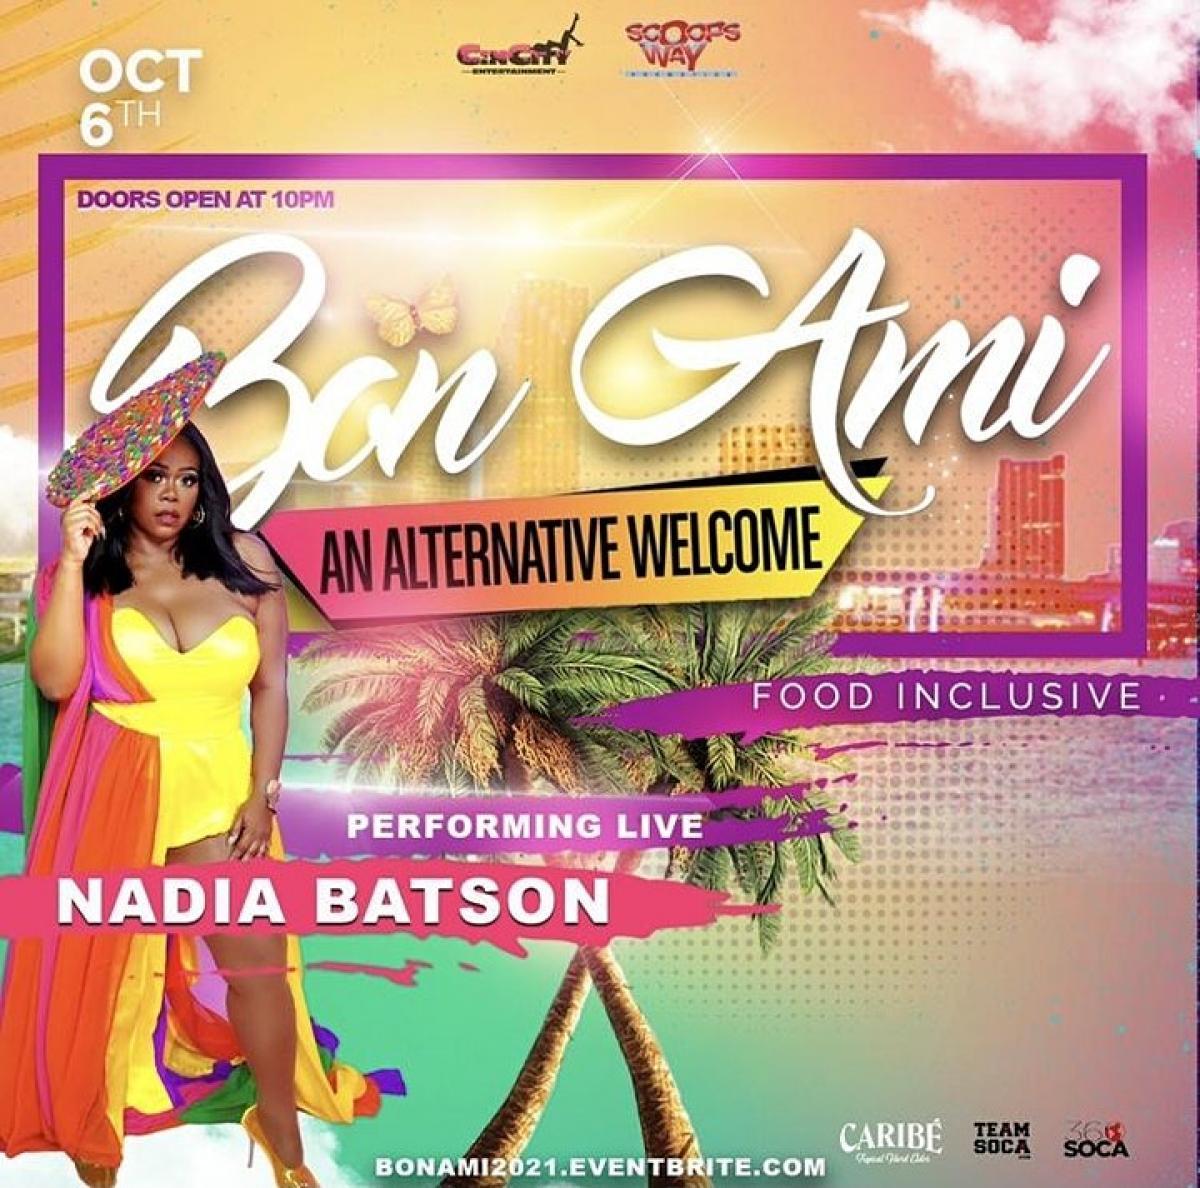 Bon Ami flyer or graphic.